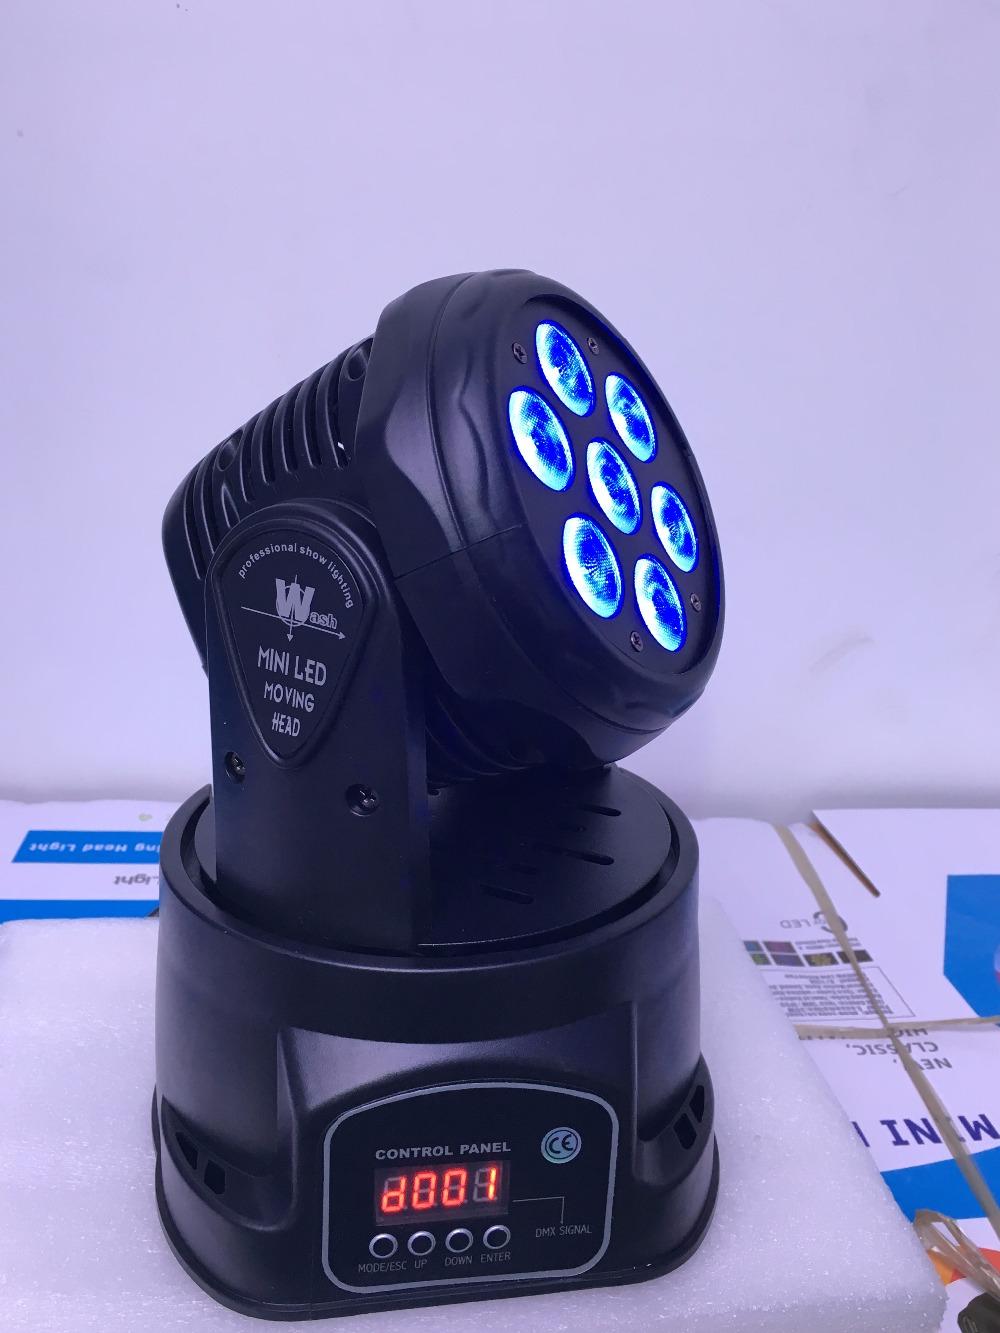 8pcs/LOT 7x12W Moving Head Beam Light Dmx Professional Lighting RGBW 4IN1 CREE LED Mini Moving Head Lighting(China (Mainland))